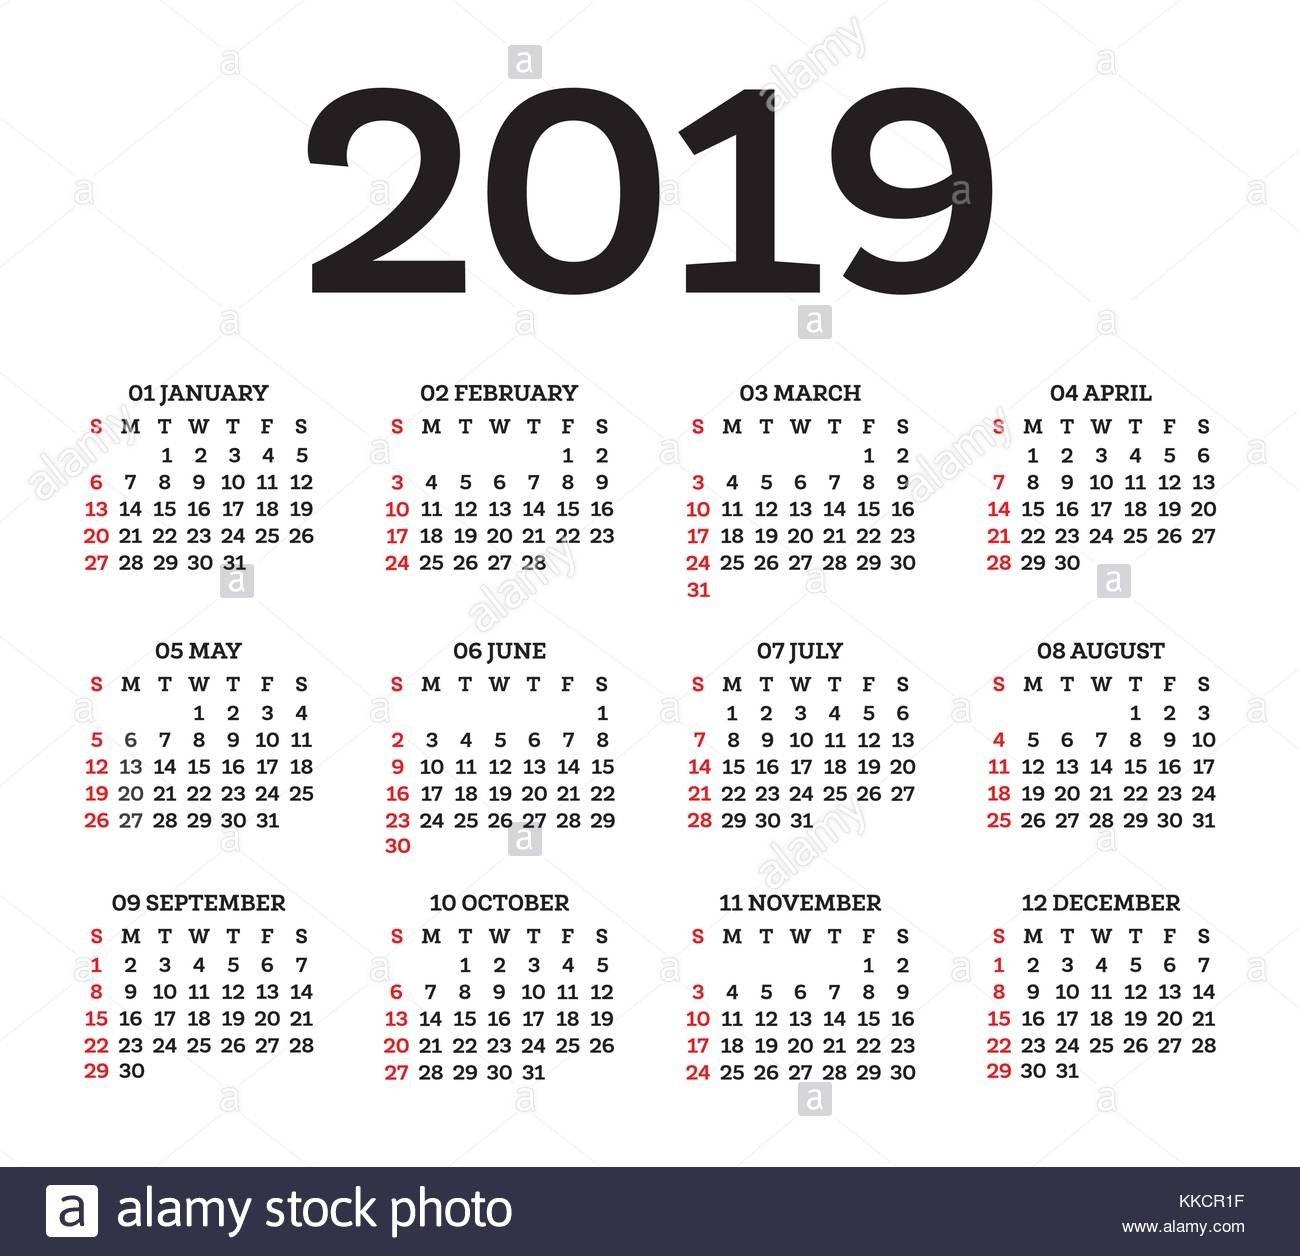 England Date Stock Vector Images - Alamy Calendar 2019 Romanesc